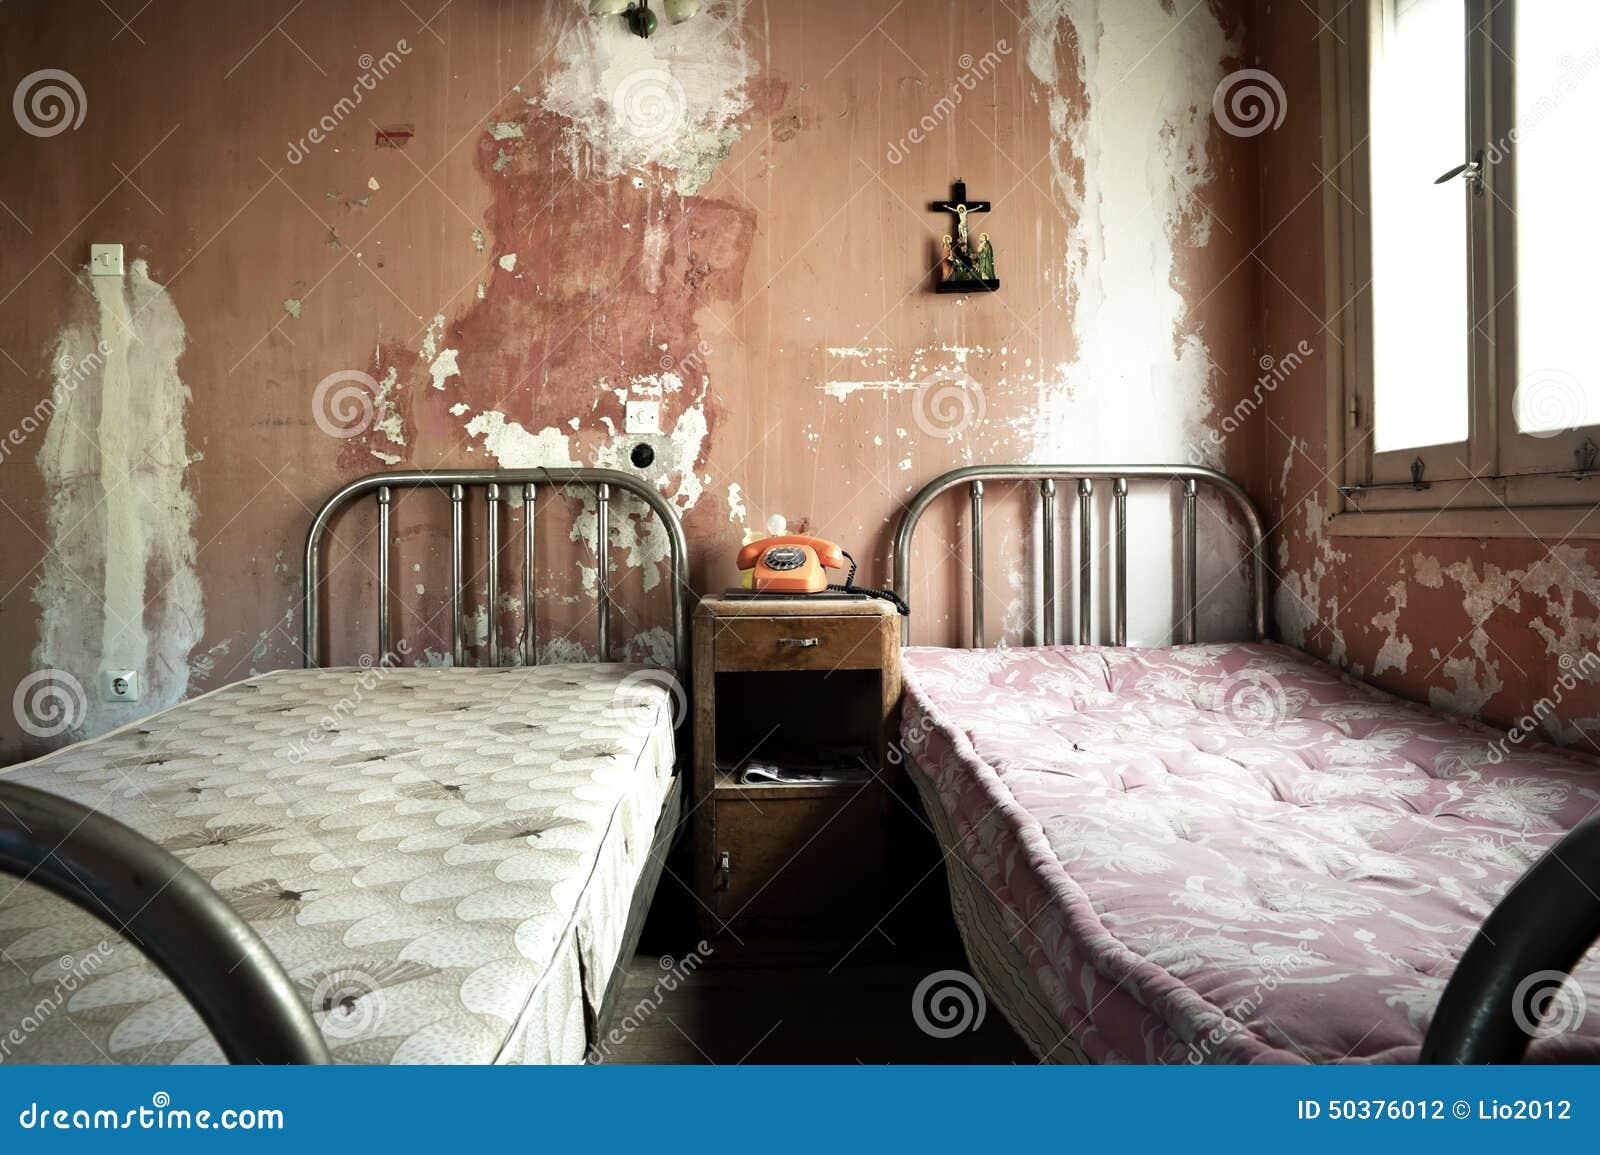 Chambre coucher sale et abandonn e rampante photo stock for Chambre 0 coucher